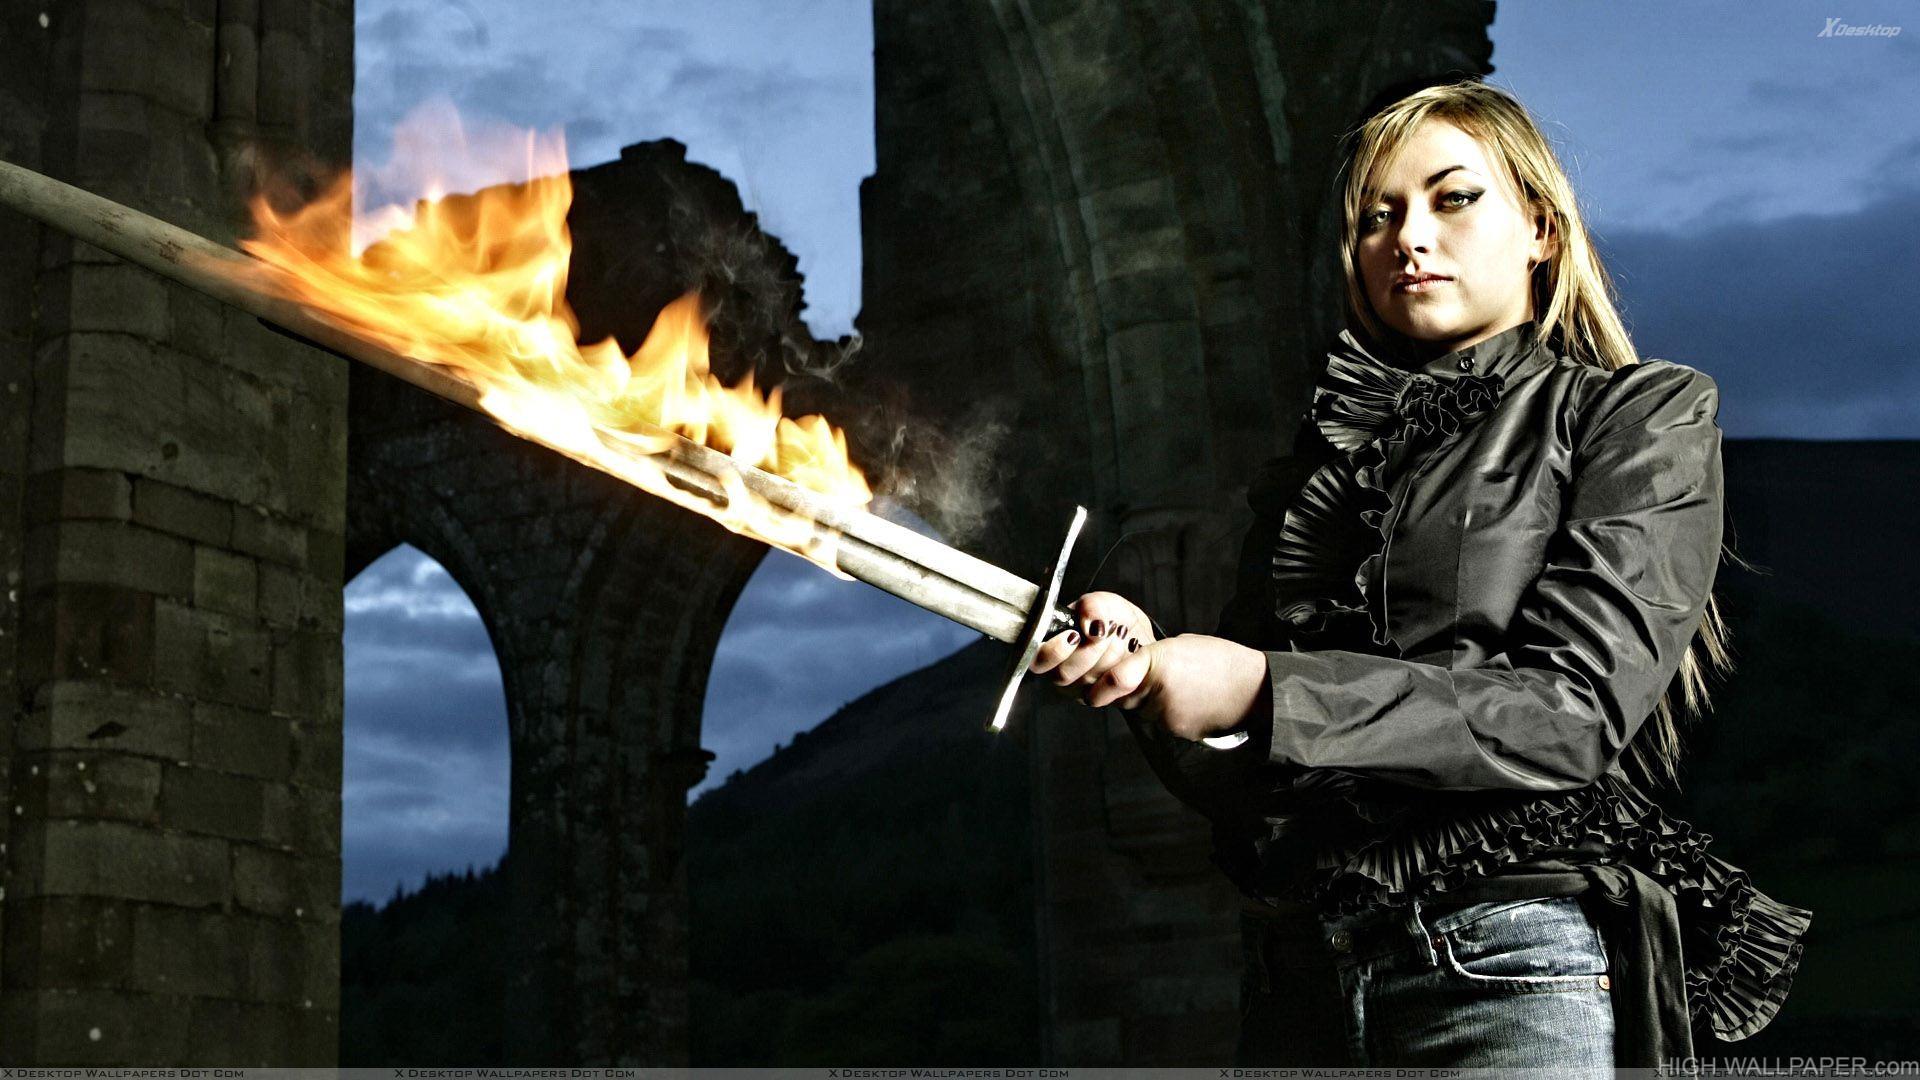 Charlotte Church Sword In Hand Photoshoot